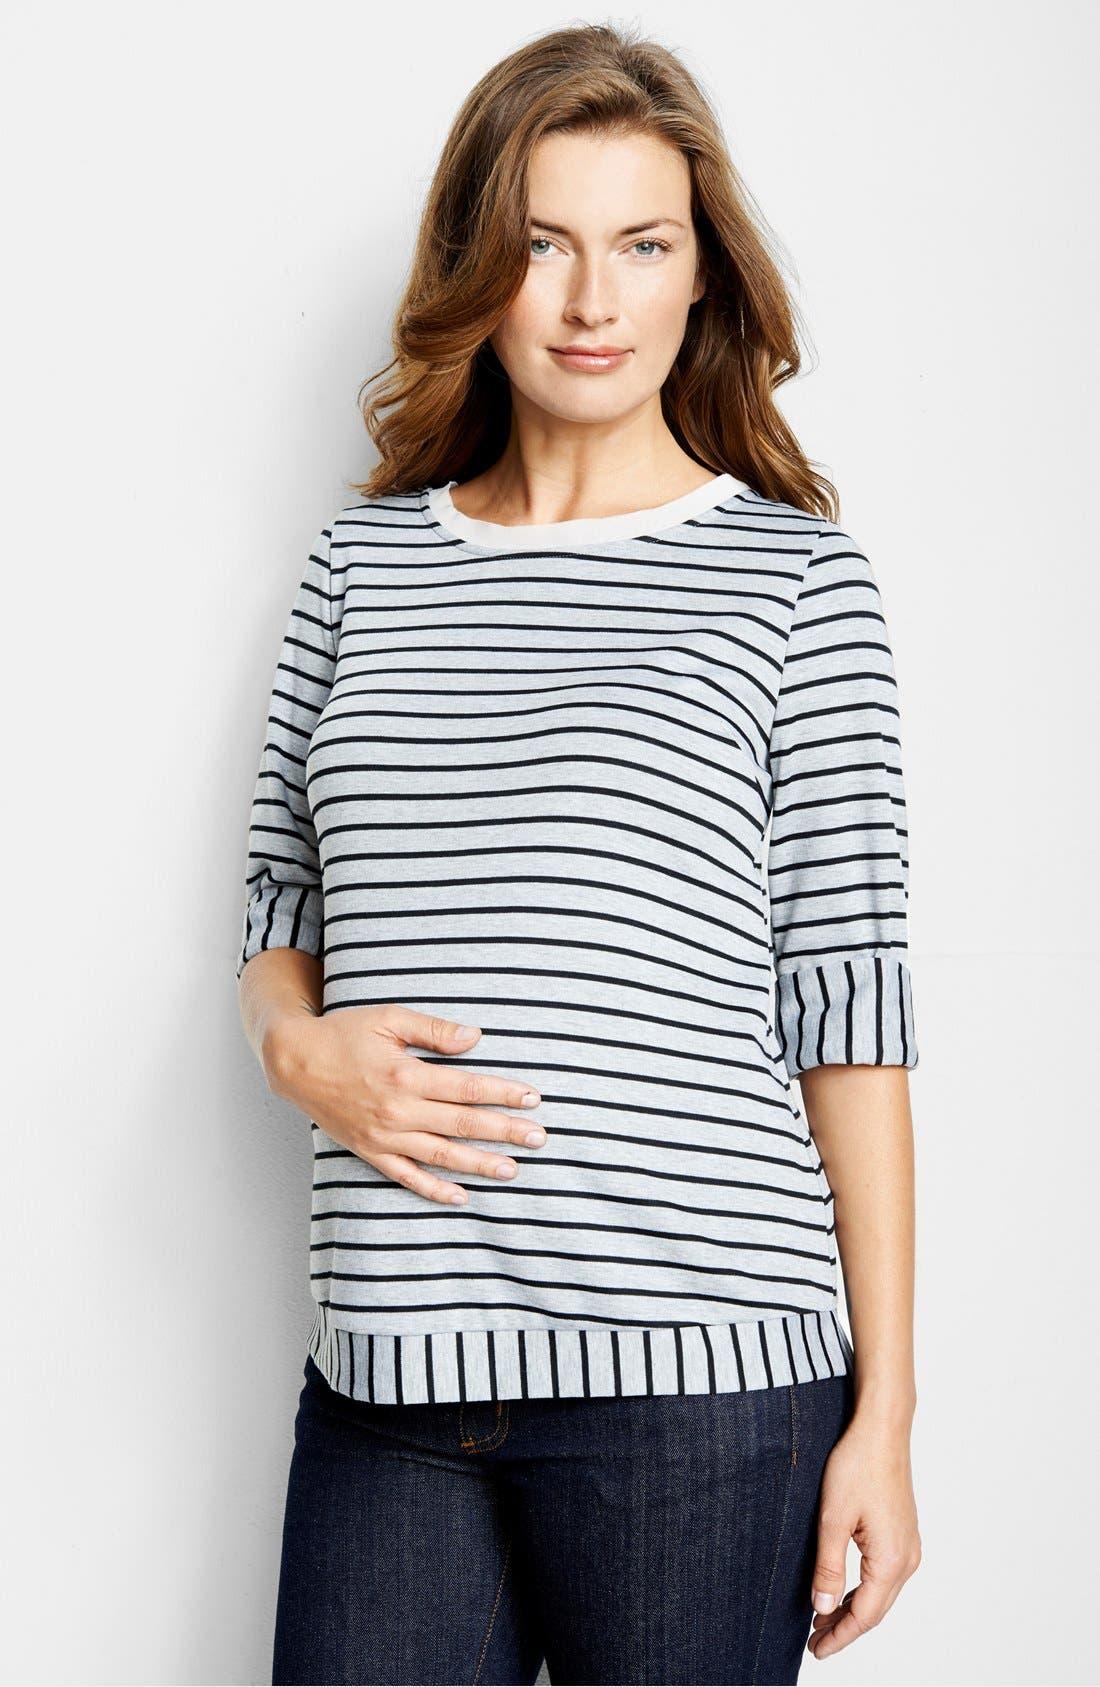 MATERNAL AMERICA 'Sailor' Maternity Top